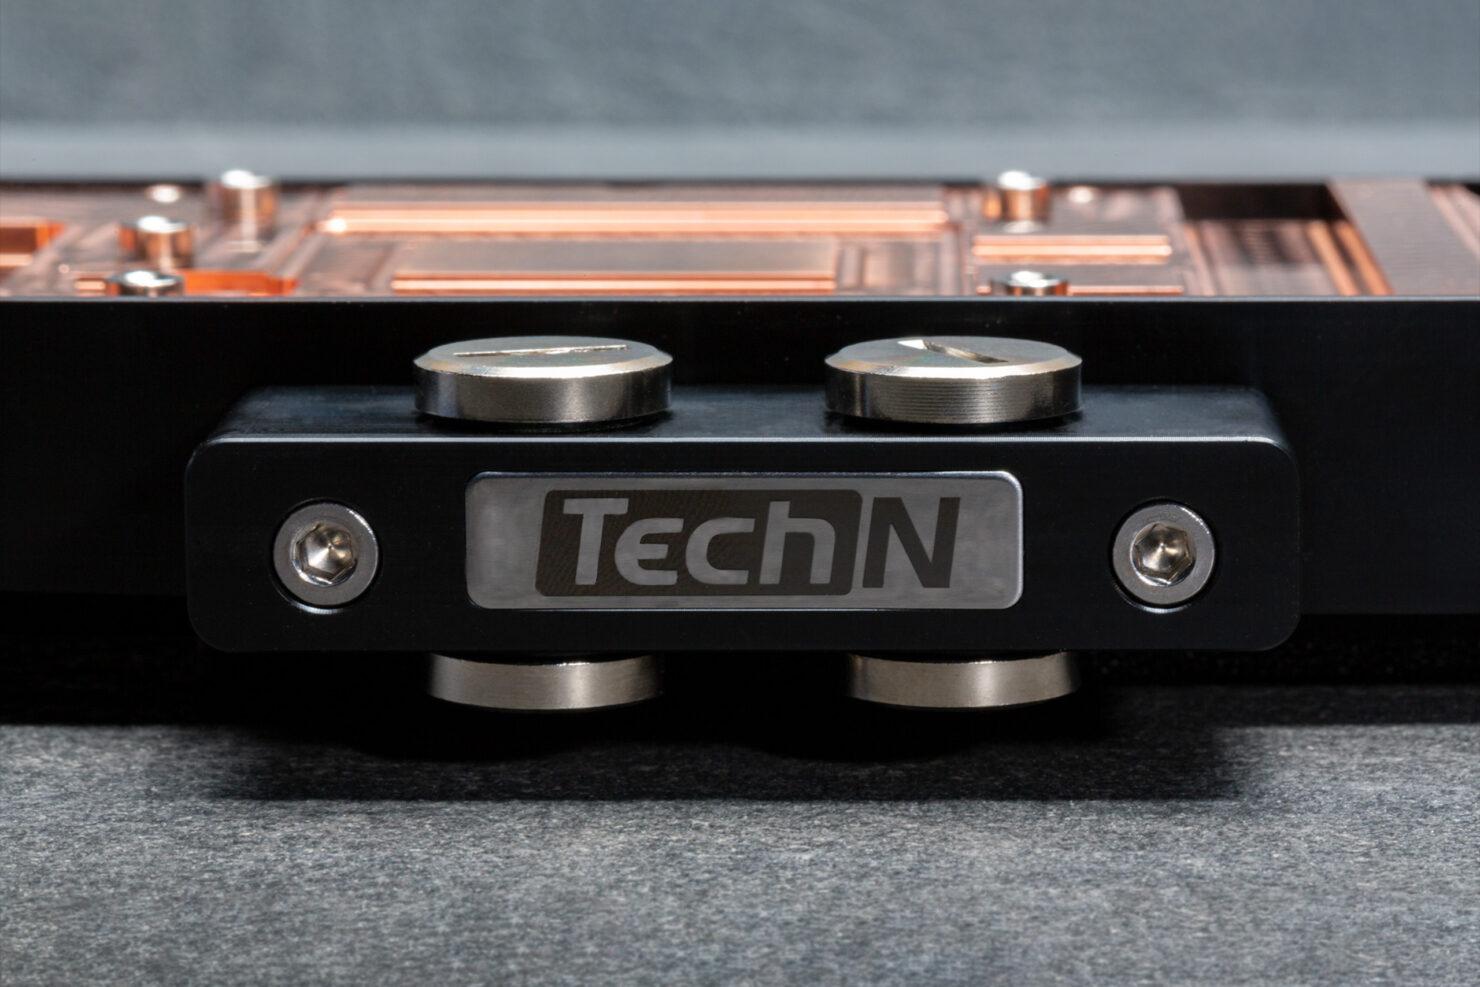 techn-water-block-pure-copper-for-amd-radeon-rx-6900-xt-rx-6800-xt-rx-6800-gpus-_6